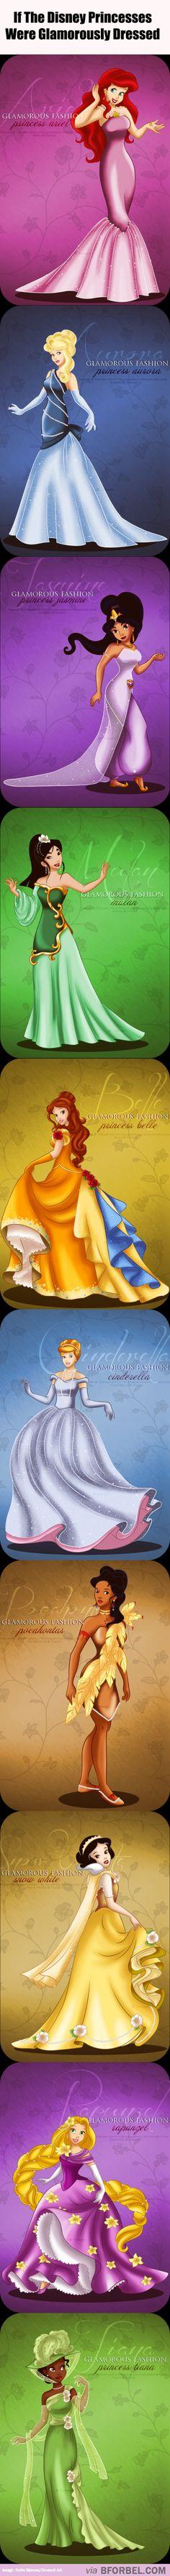 10 Glamorously Dressed Disney Princesses…